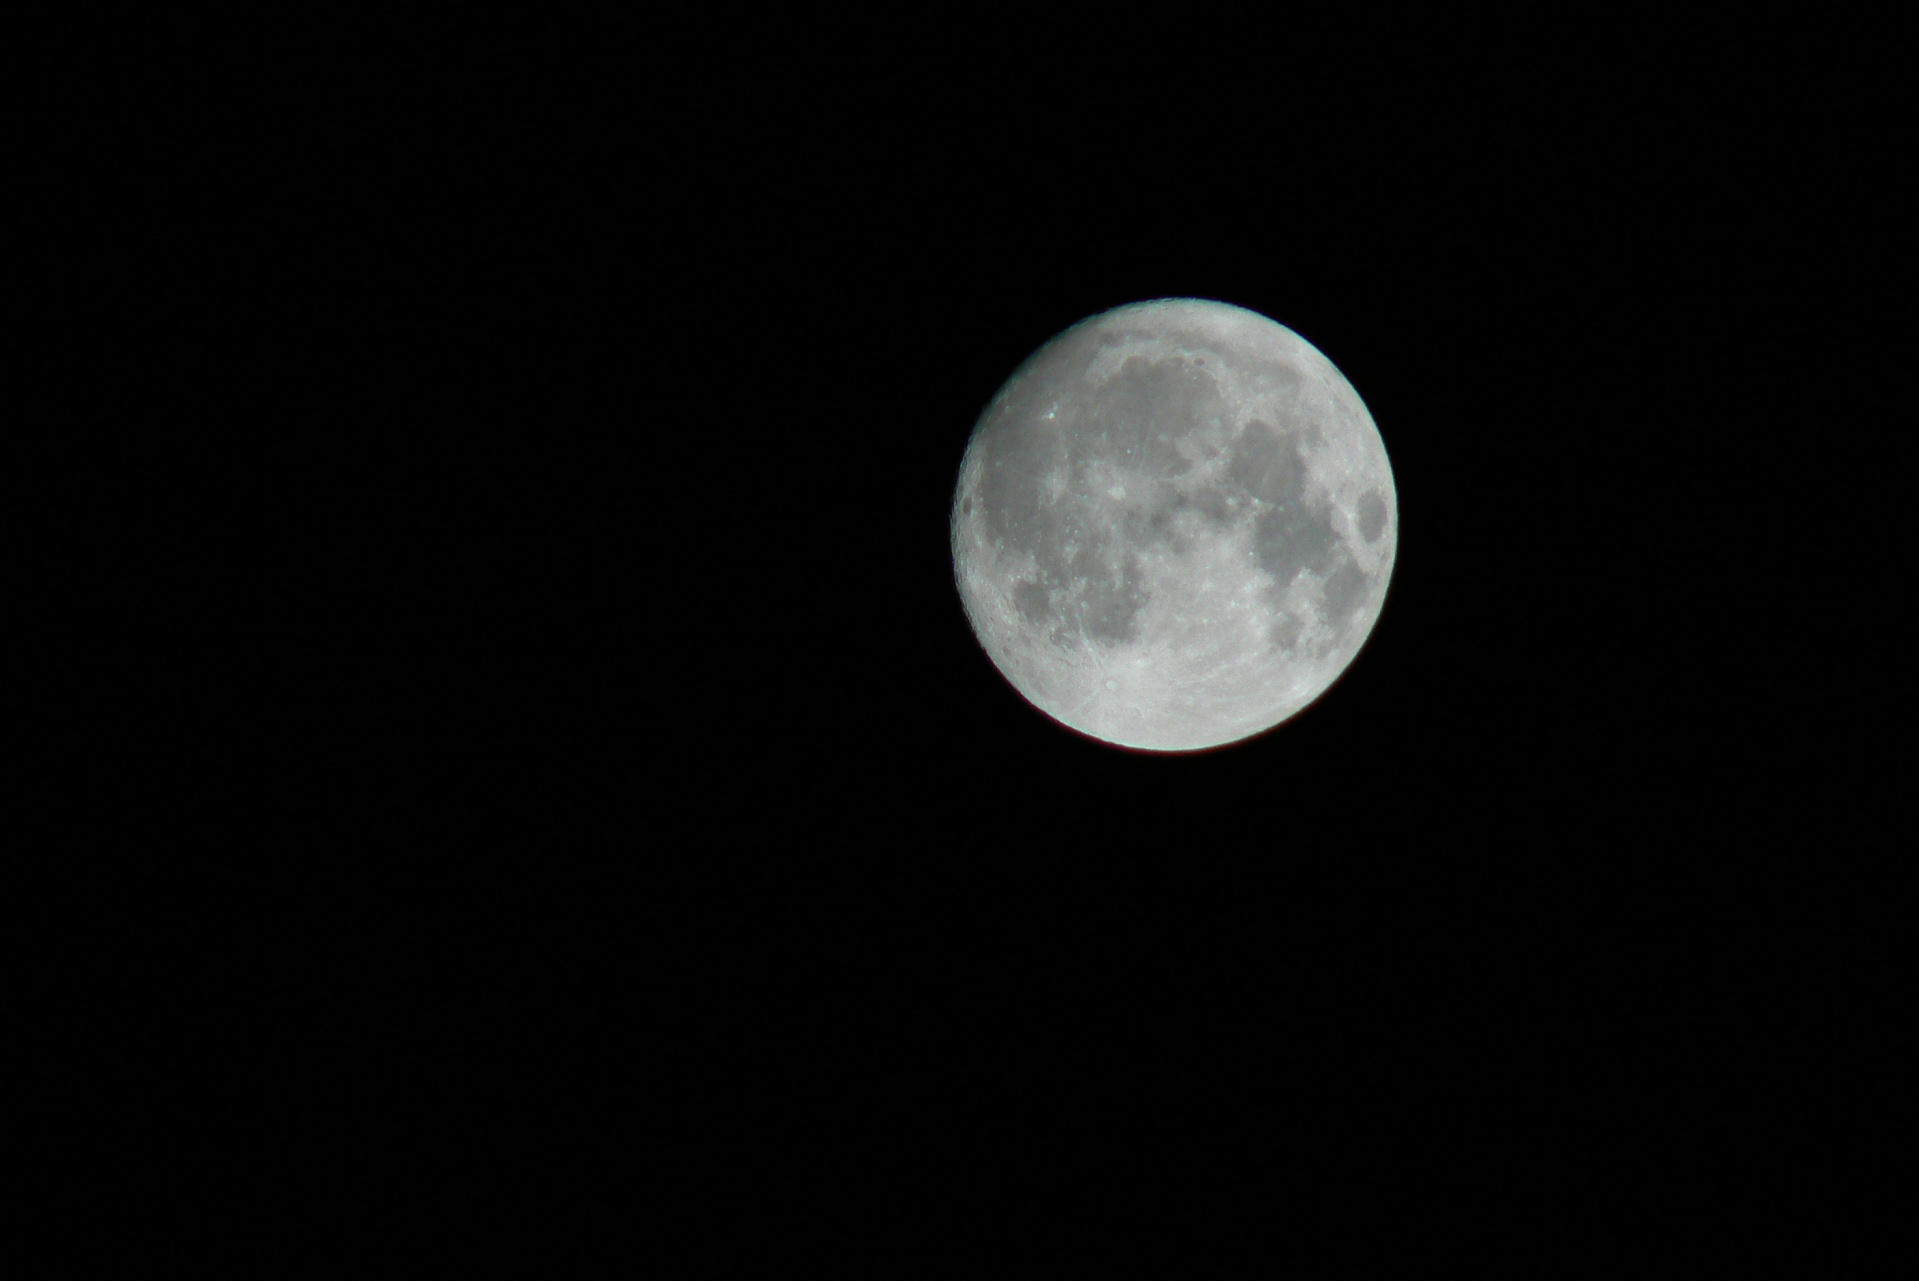 Bokeh,full-moon,planet,space,landscape - free photo from needpix com